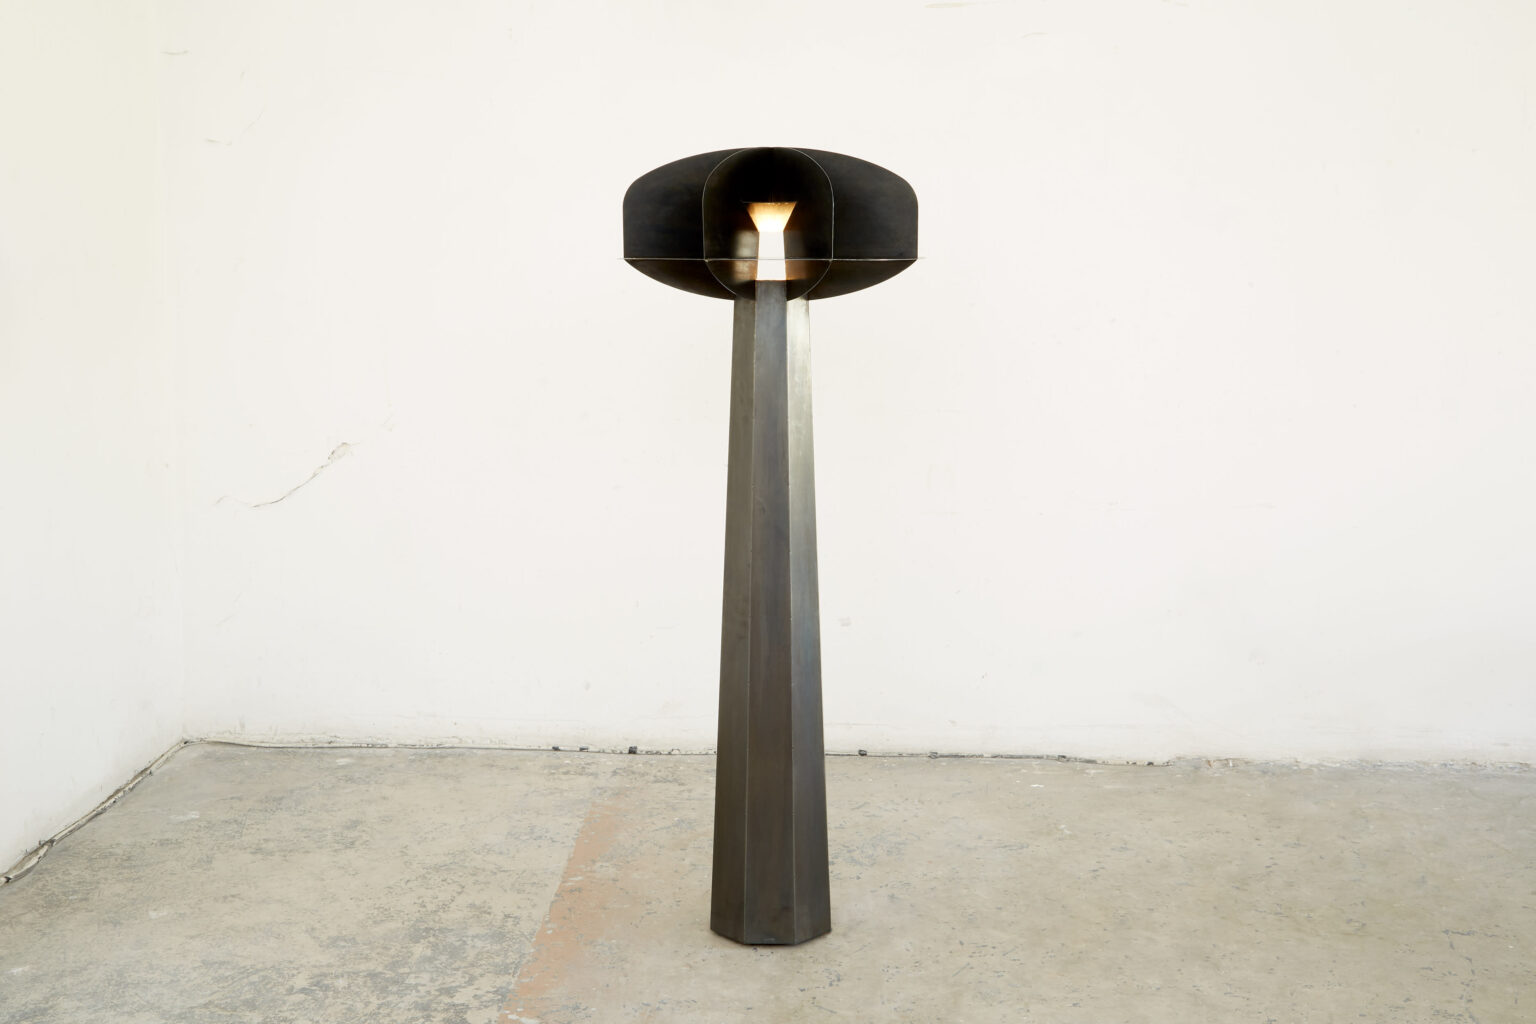 Solstice Large Lamp – Steel, 2021